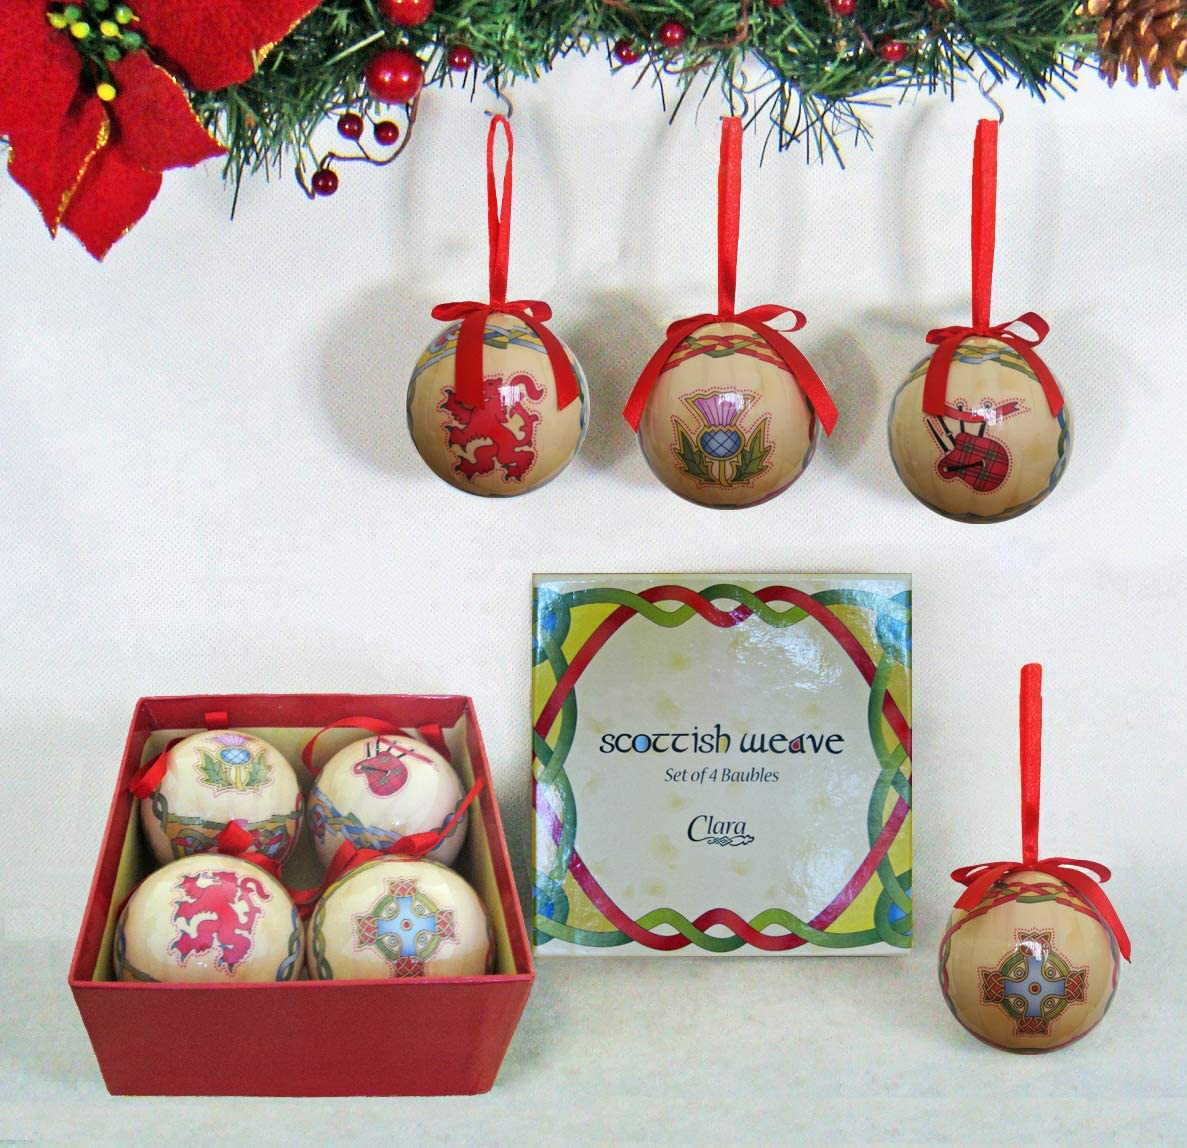 Royal Tara Scottish Emblem Christmas Baubles Set of 4